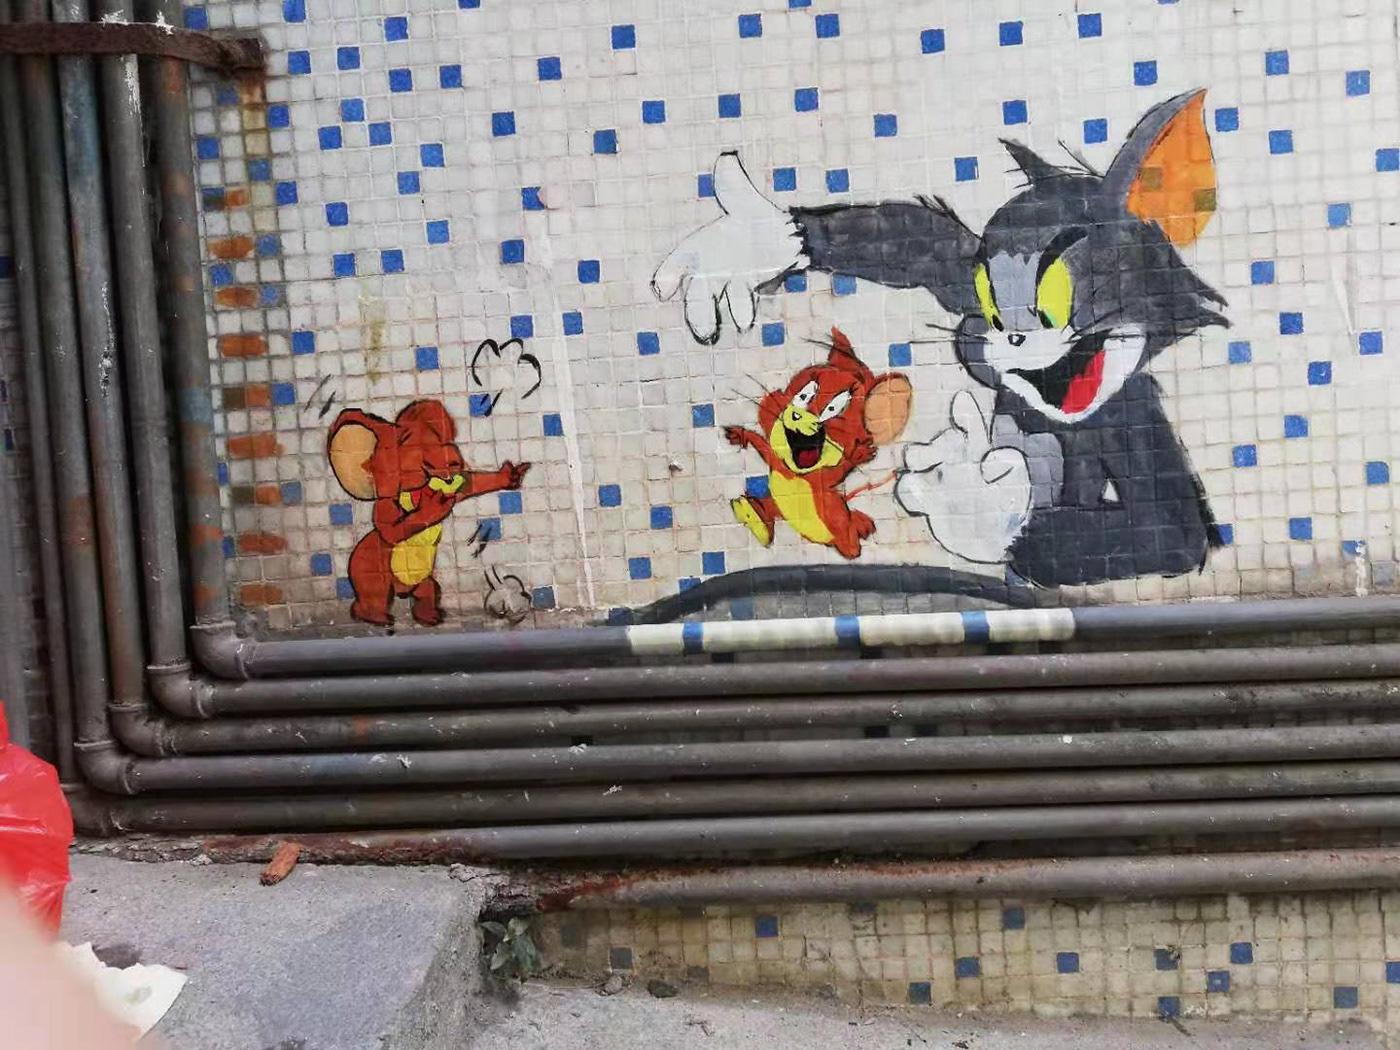 Image may contain: cartoon, graffiti and outdoor